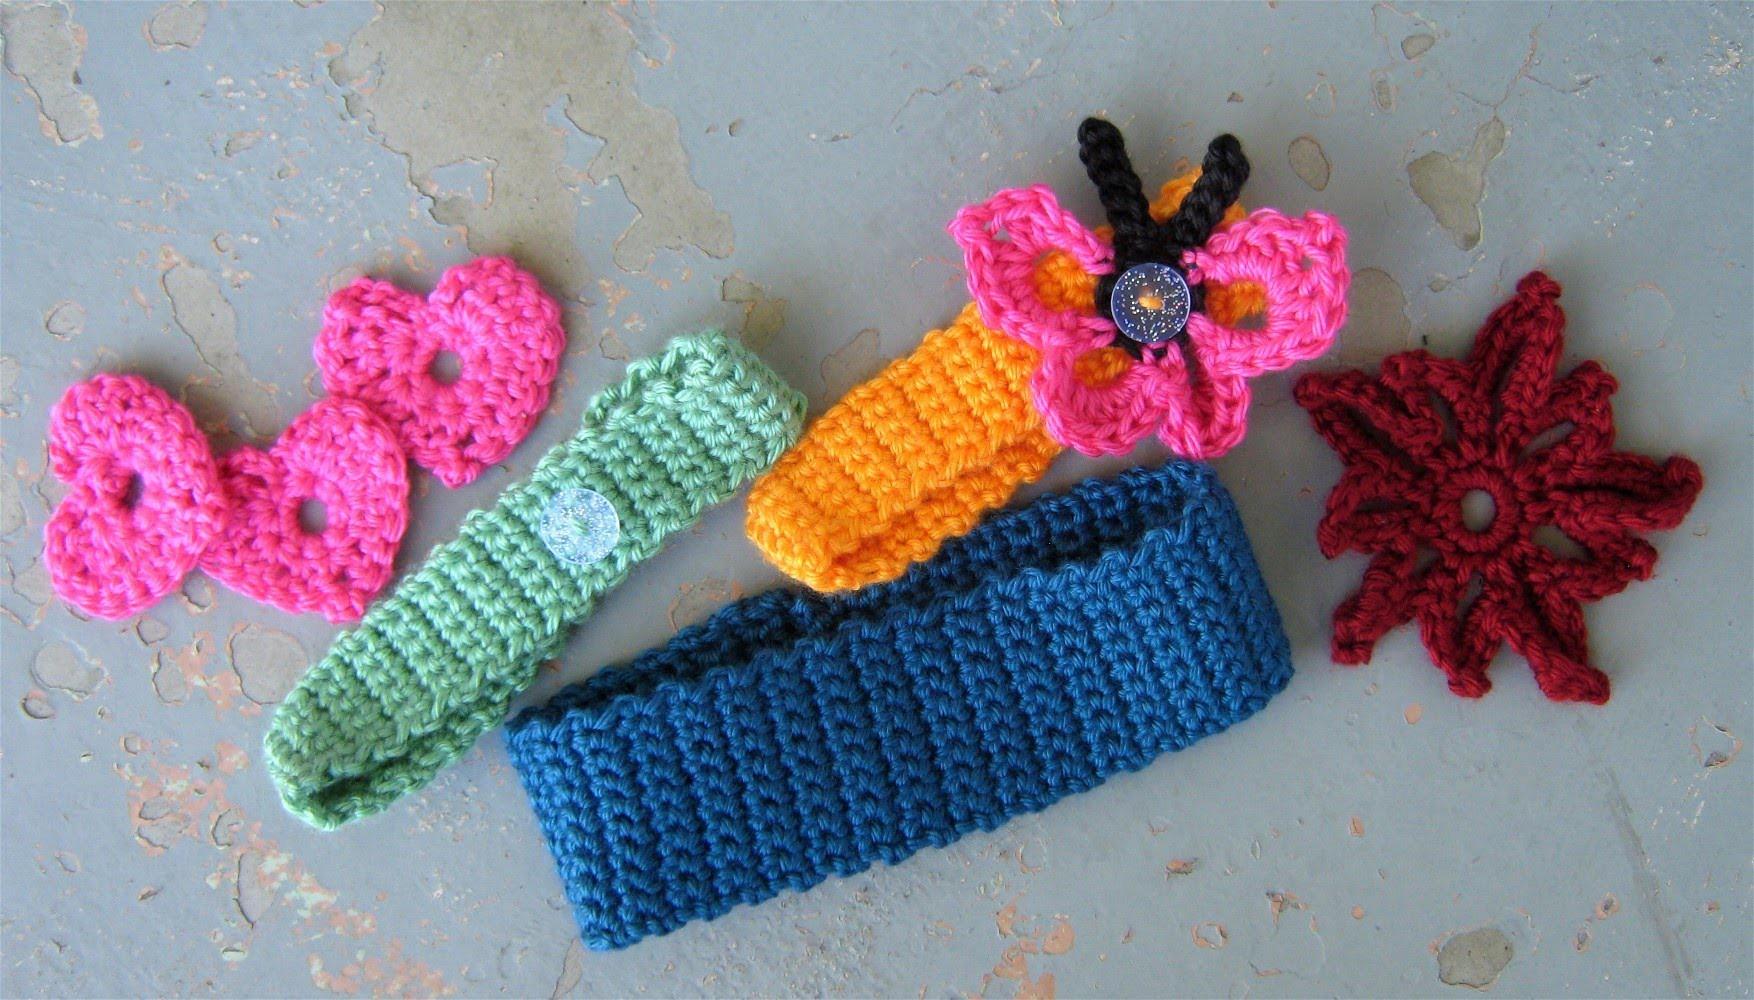 How to crochet a basic headband or hairband, easy